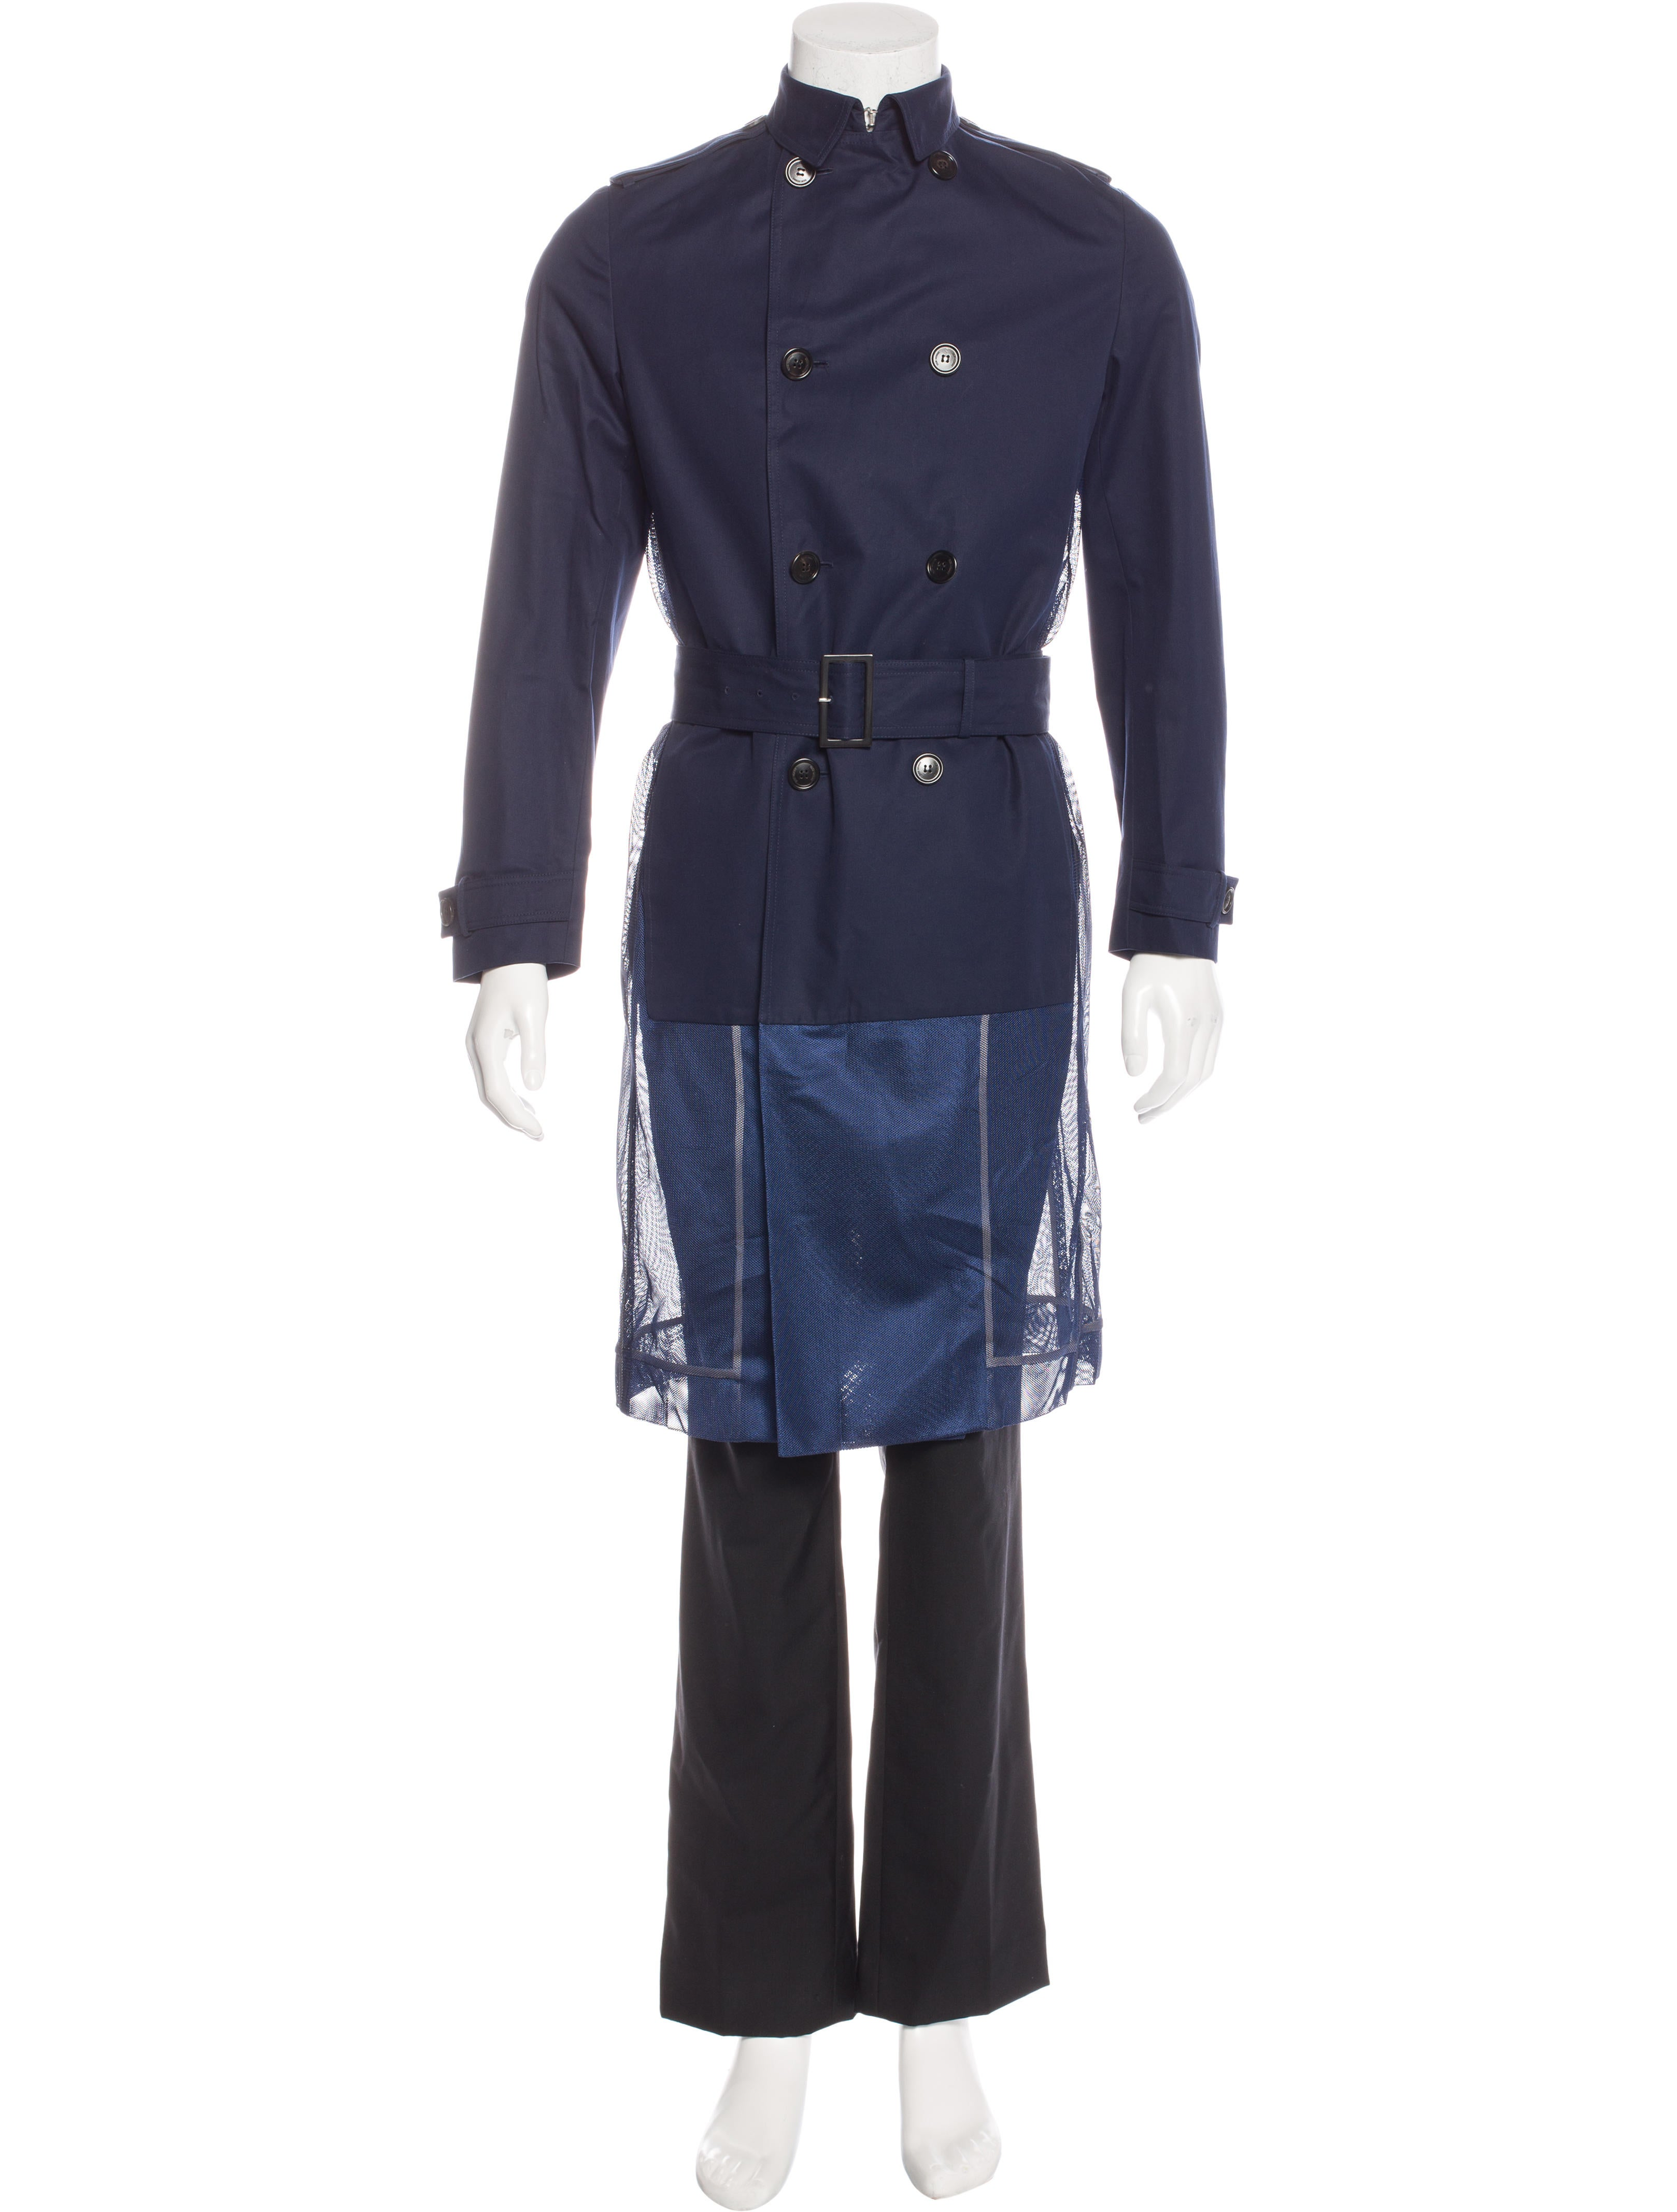 dior homme mesh paneled trench coat clothing hmm22750. Black Bedroom Furniture Sets. Home Design Ideas